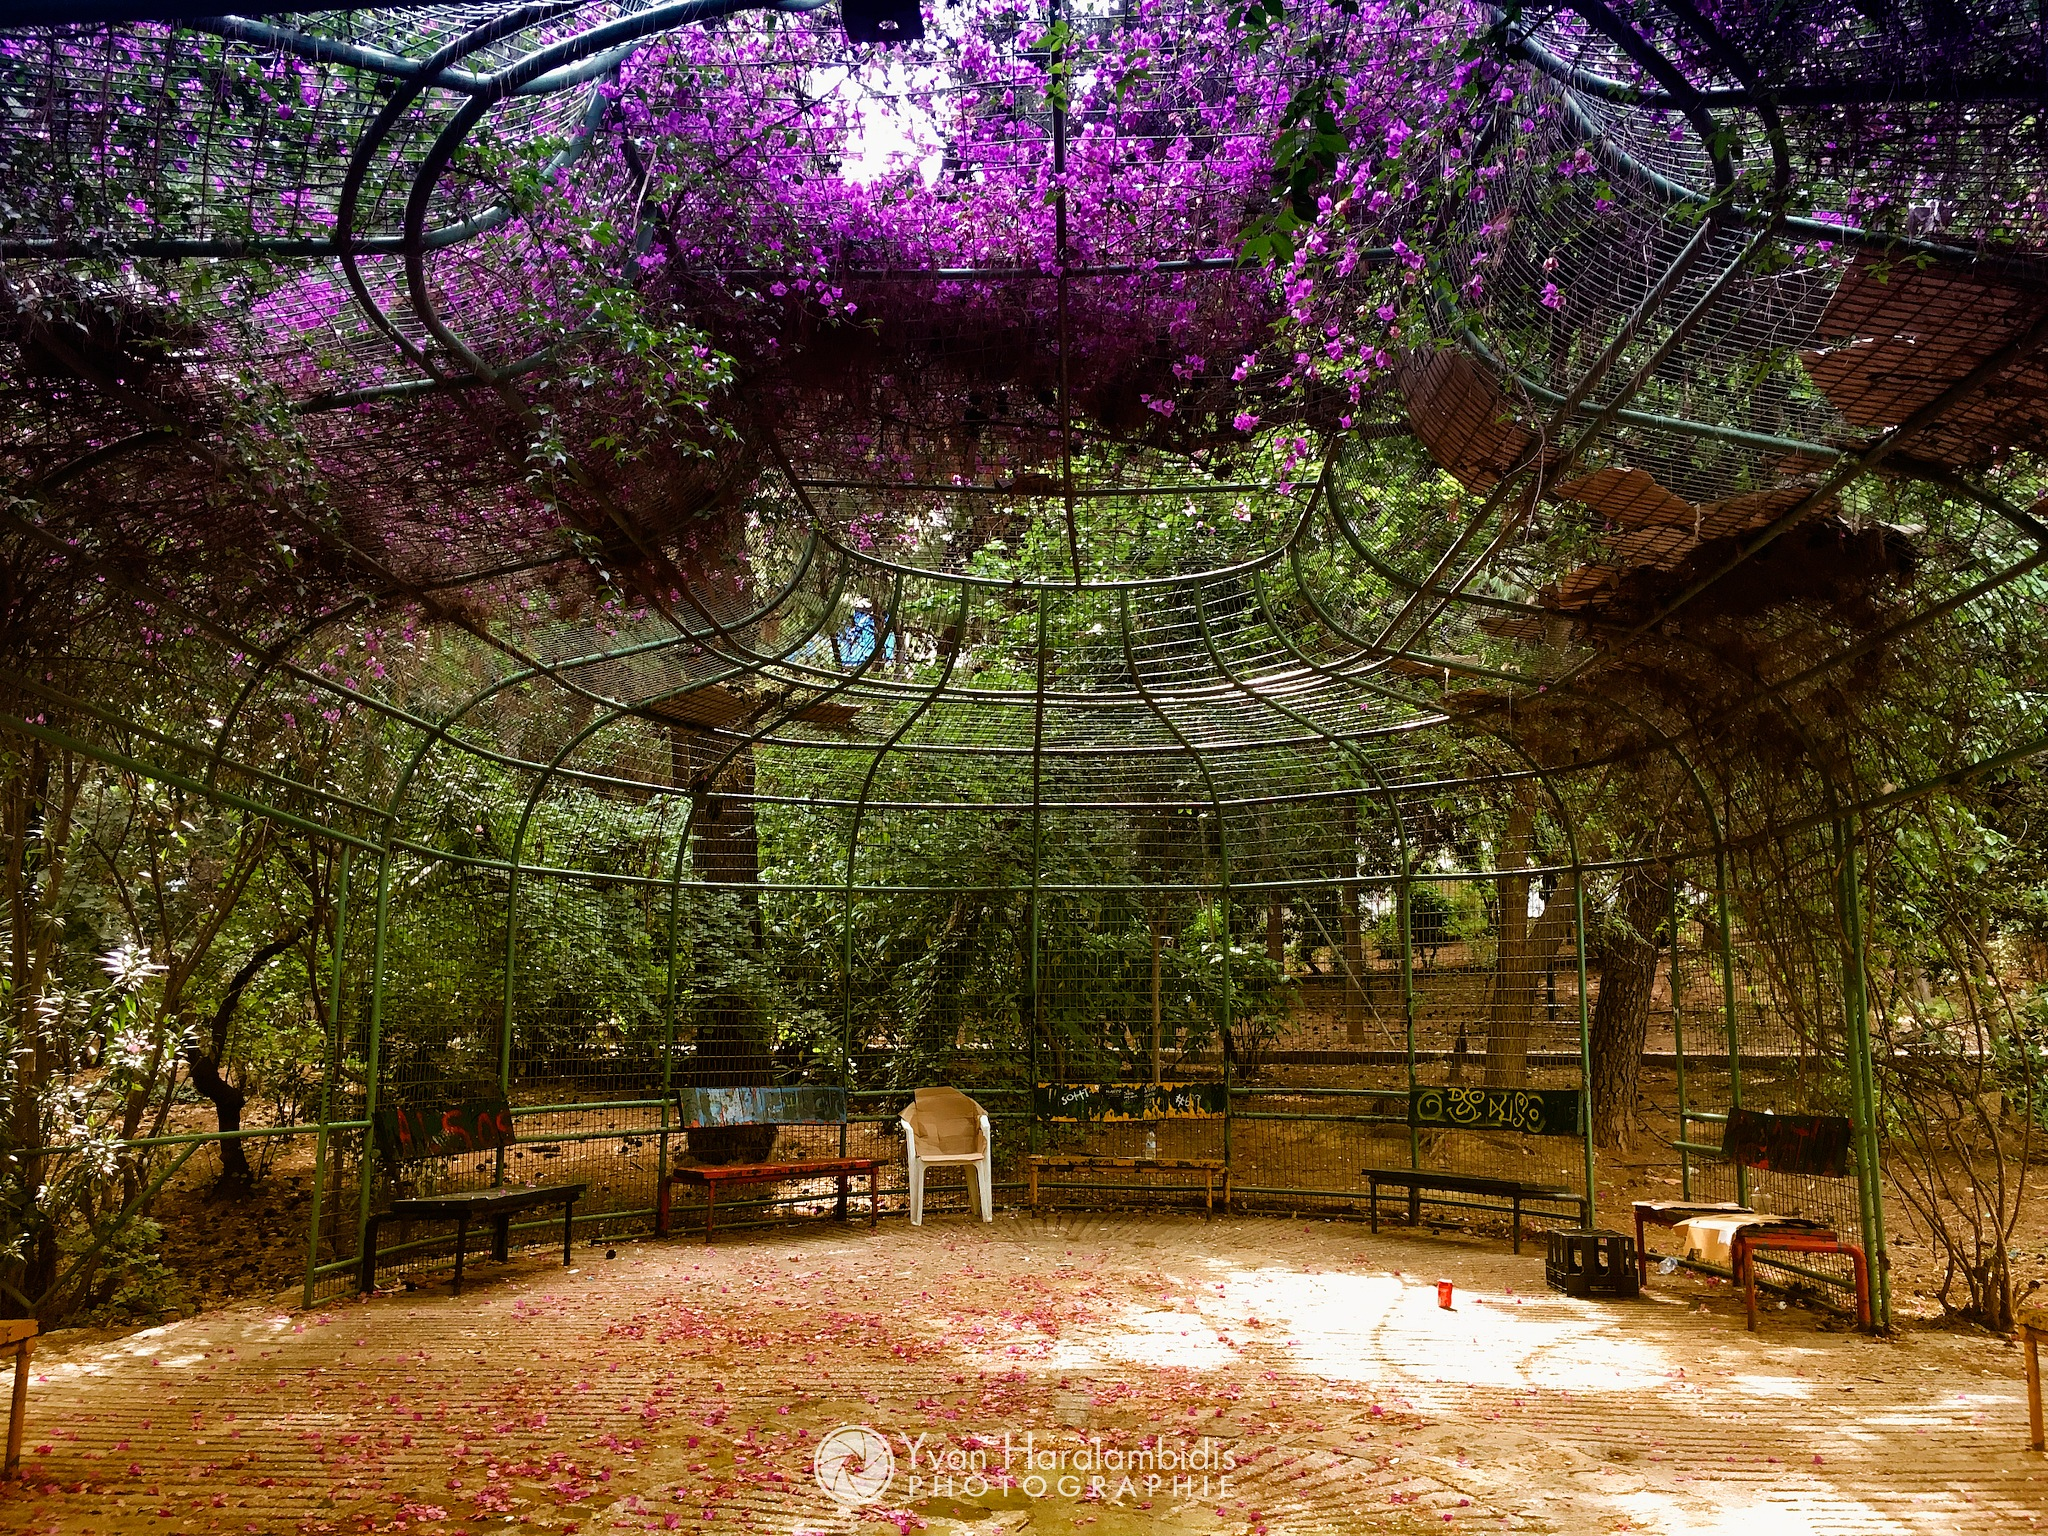 Détente à Athènes by Yvan Haralambidis